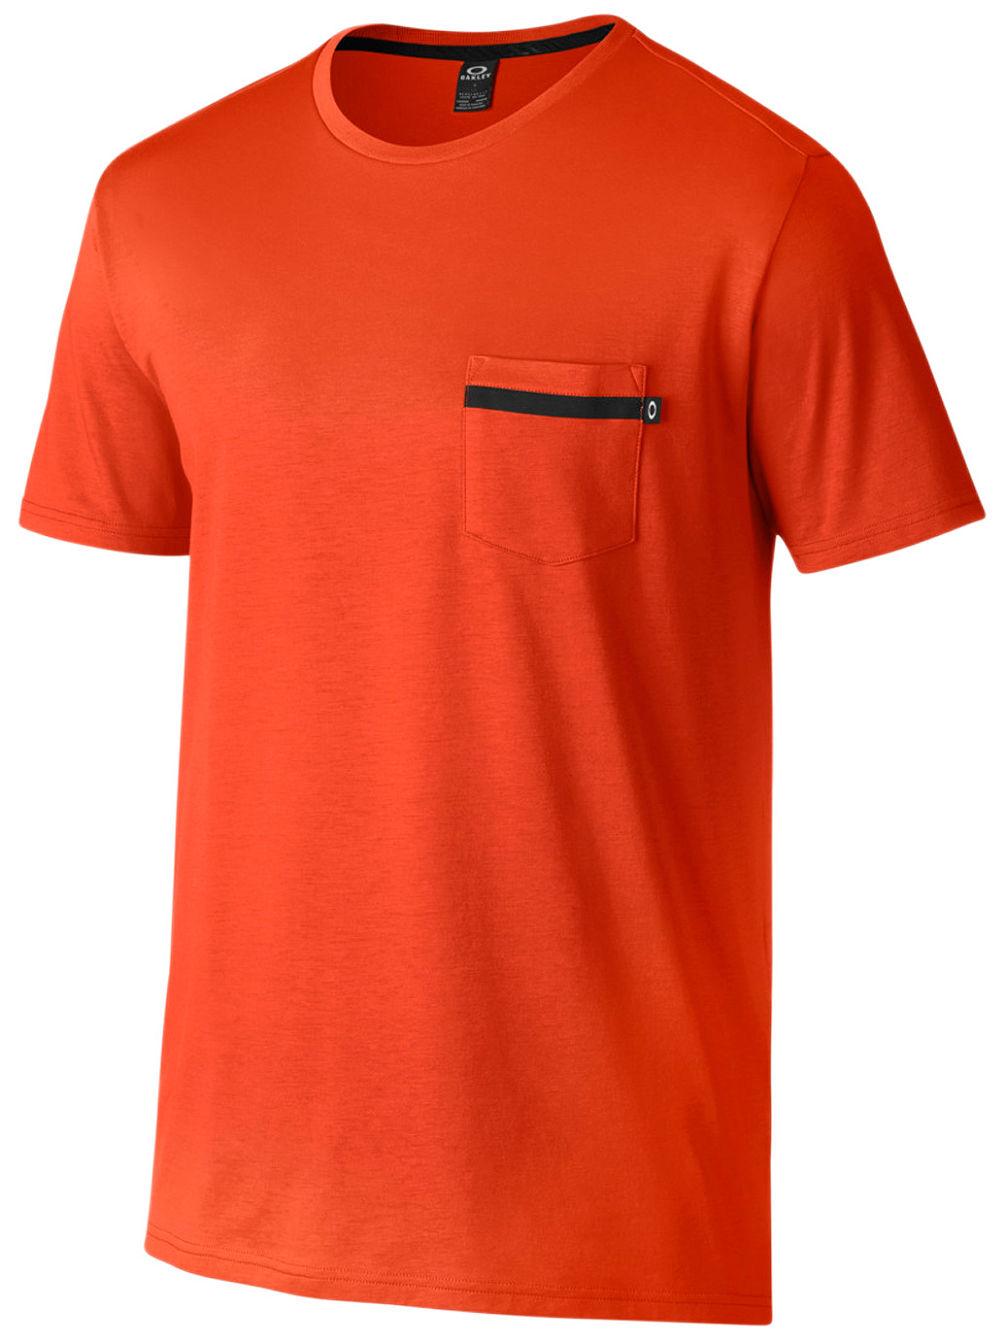 optimum-t-shirt